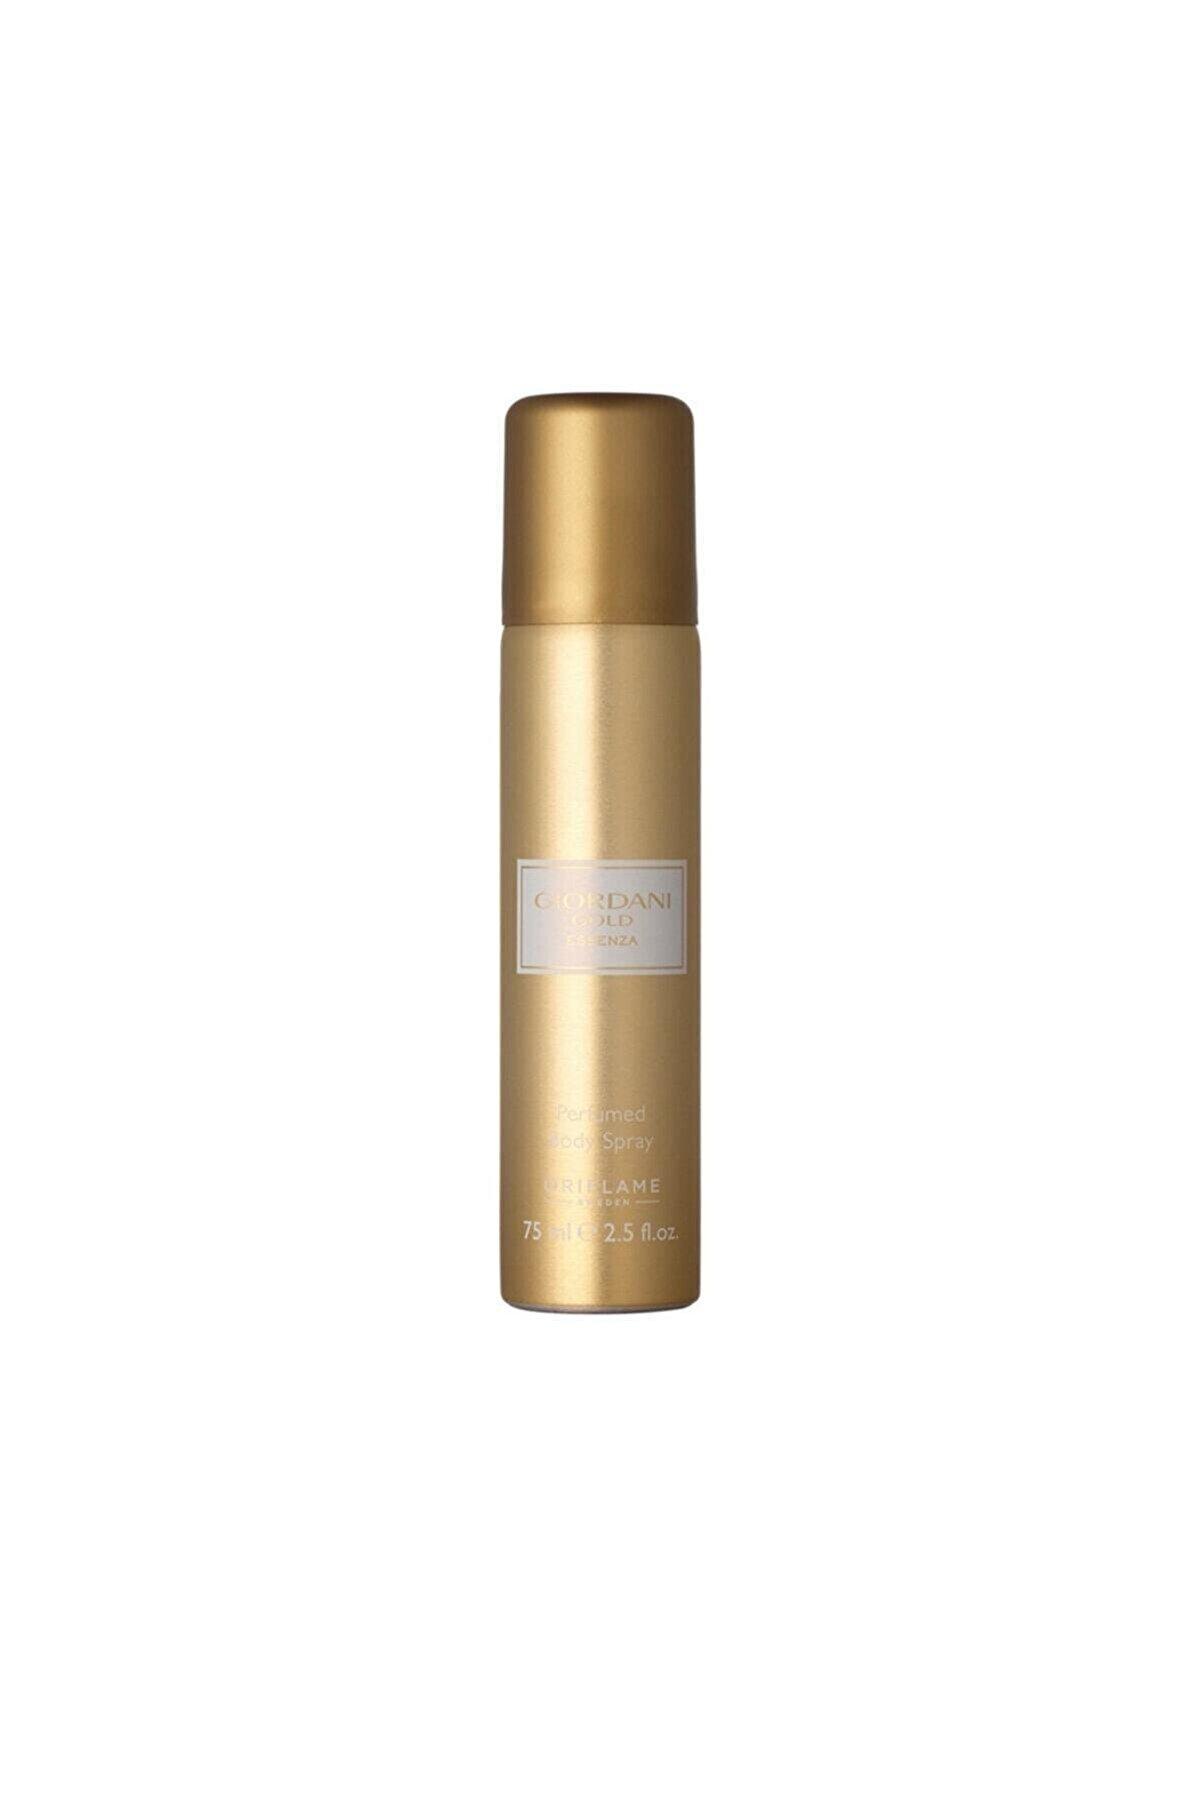 Oriflame Giordani Gold Giordani Gold Essenza Parfümlü Vücut Spreyi 75ml 8681541005086